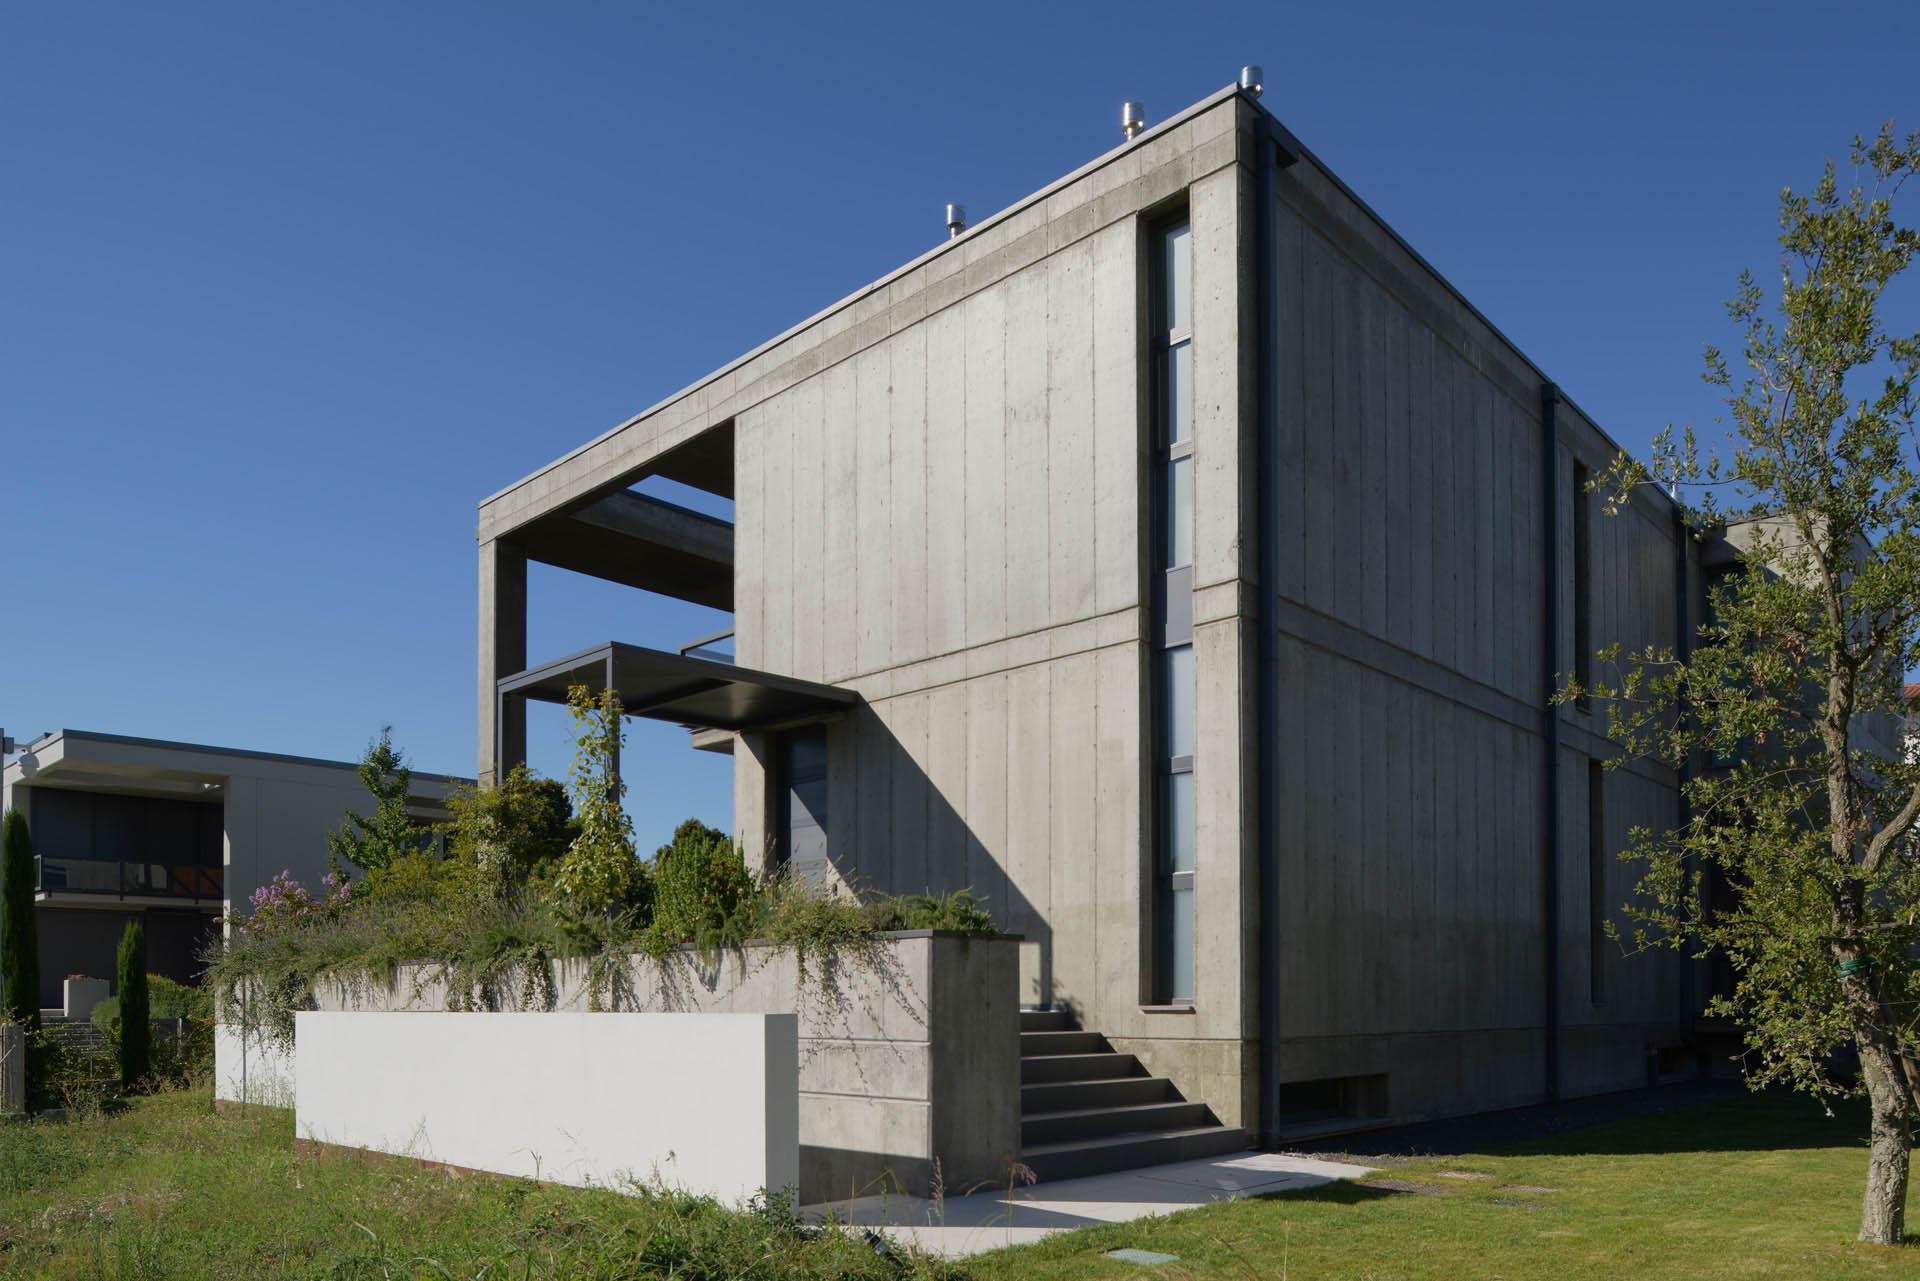 03 Studio Bacchi architetti associati casa 3 img 03